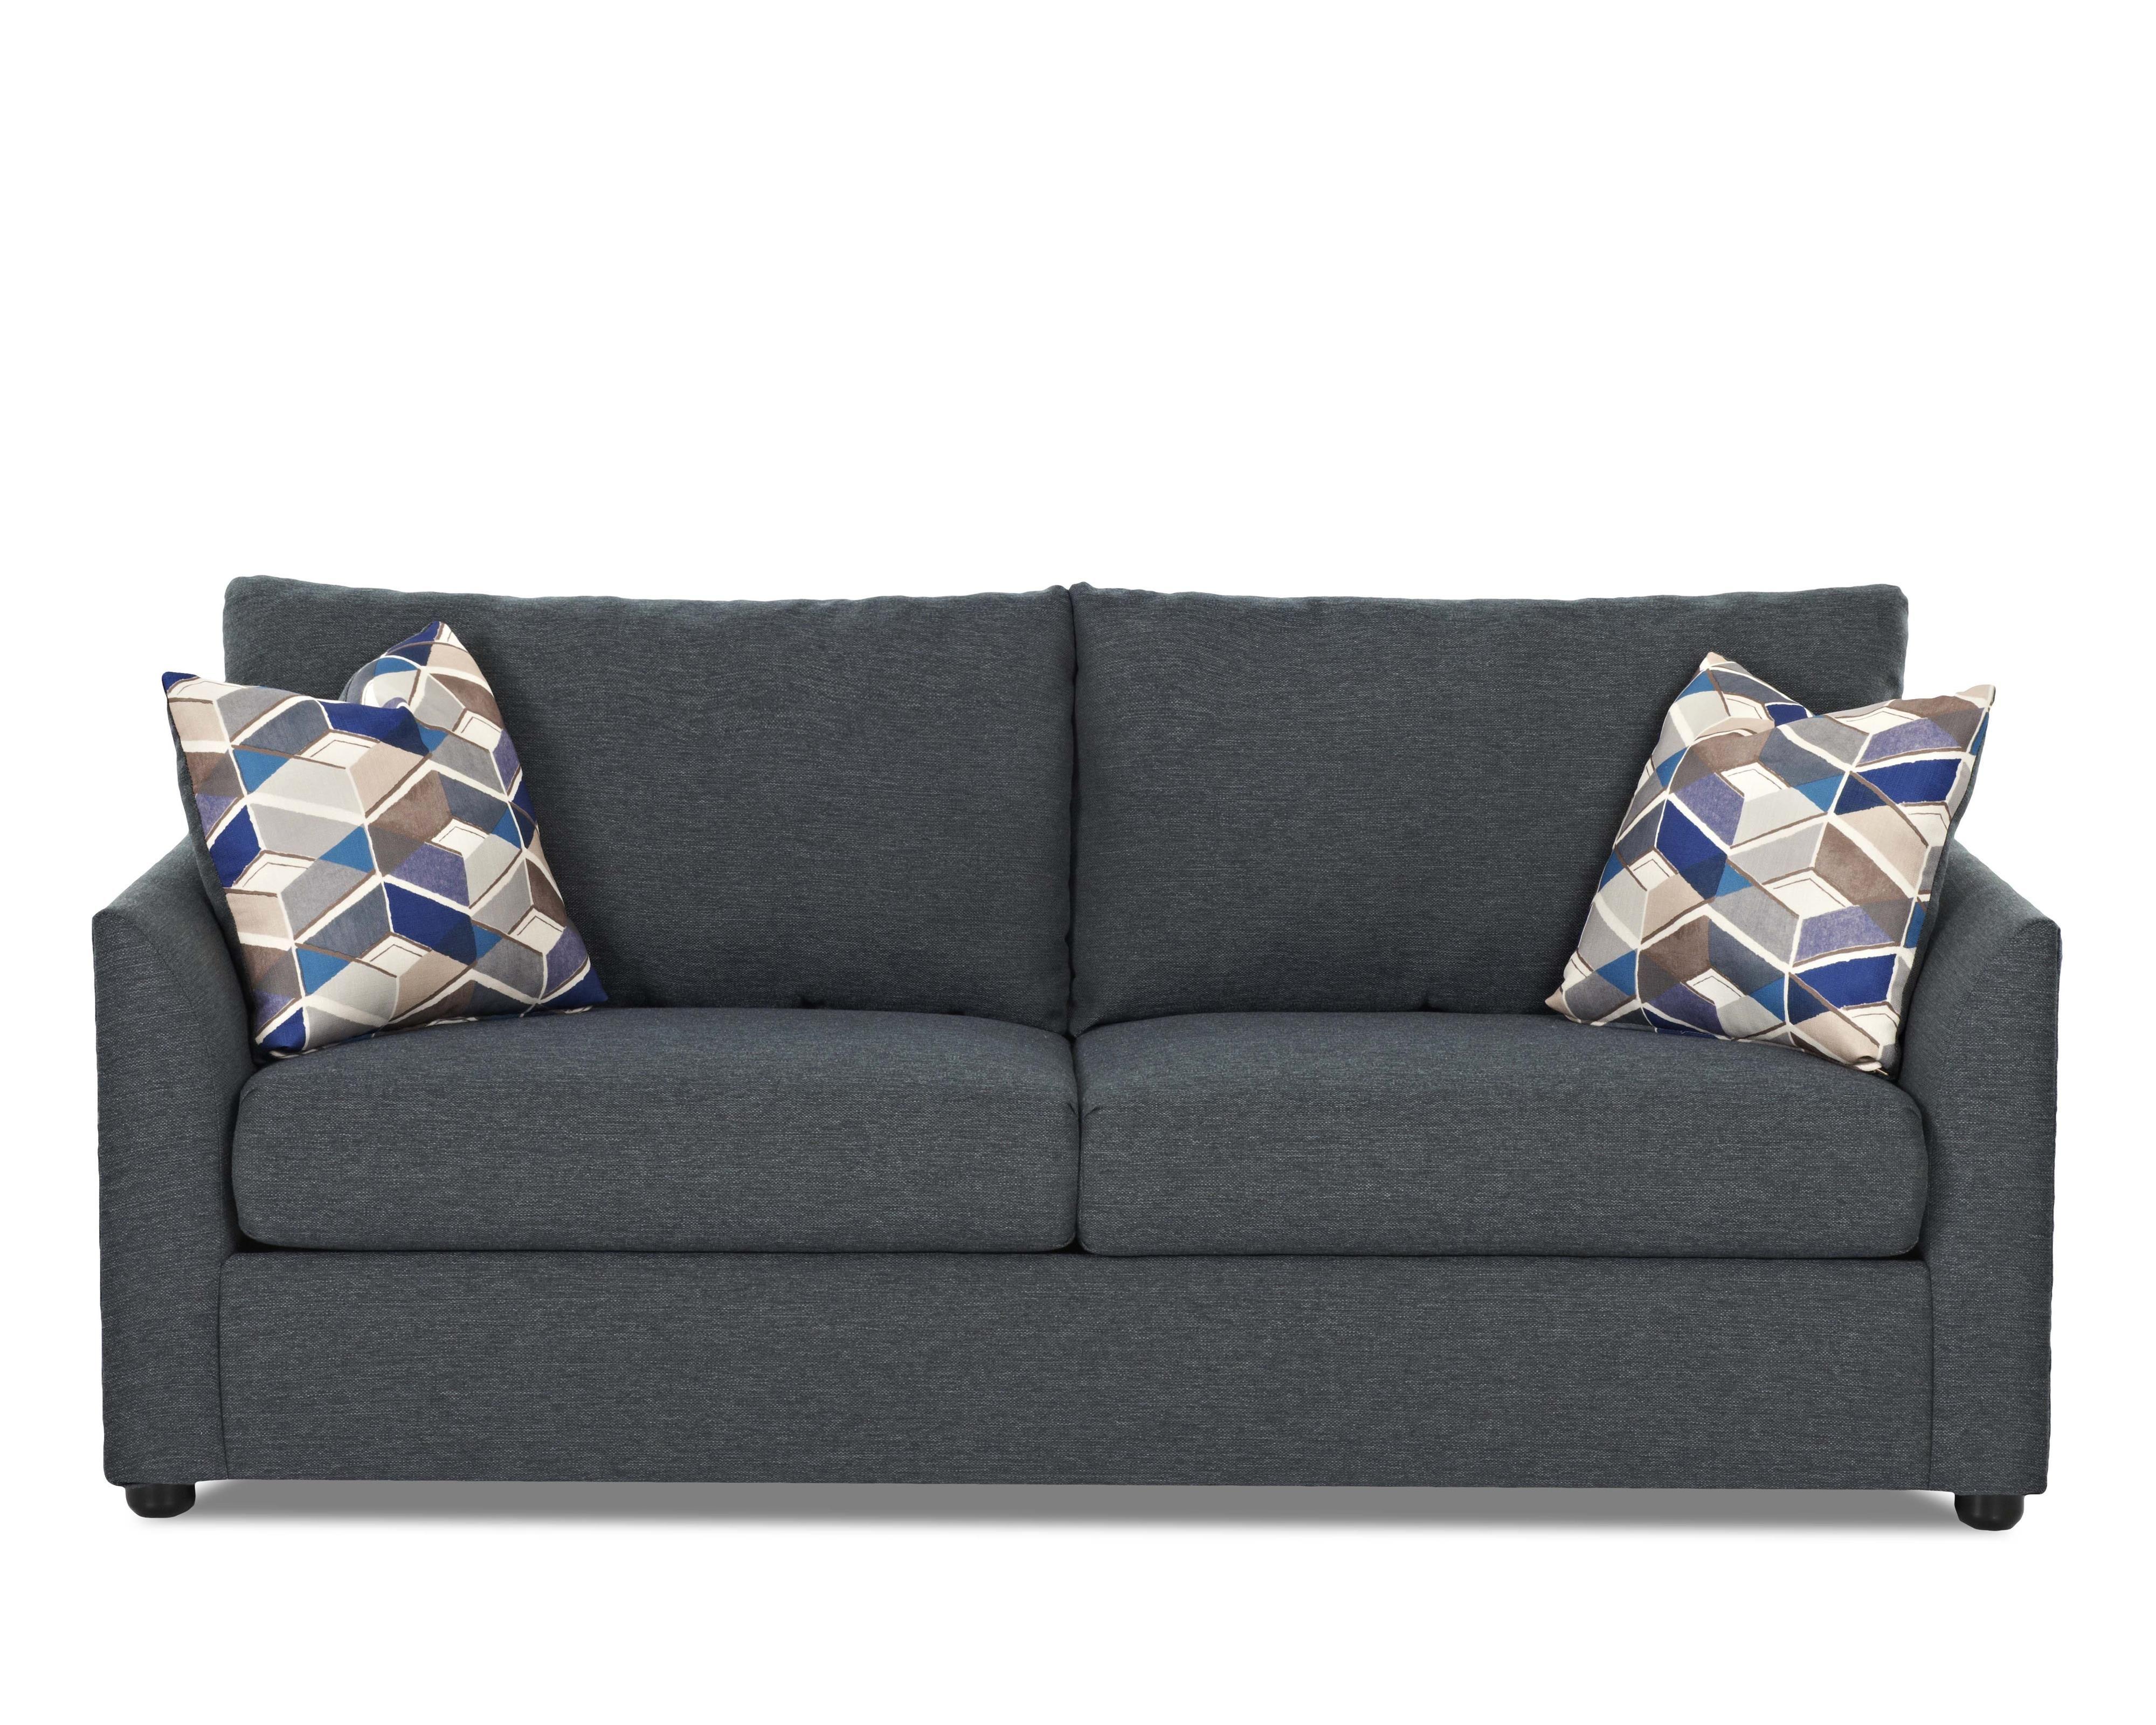 Kalvin Stylish Regular Size Sofa Sleeper With Dreamquest Innerspring Mattress By Klaussner At Hudson S Furniture Den Furniture Sleeper Sofa Furniture